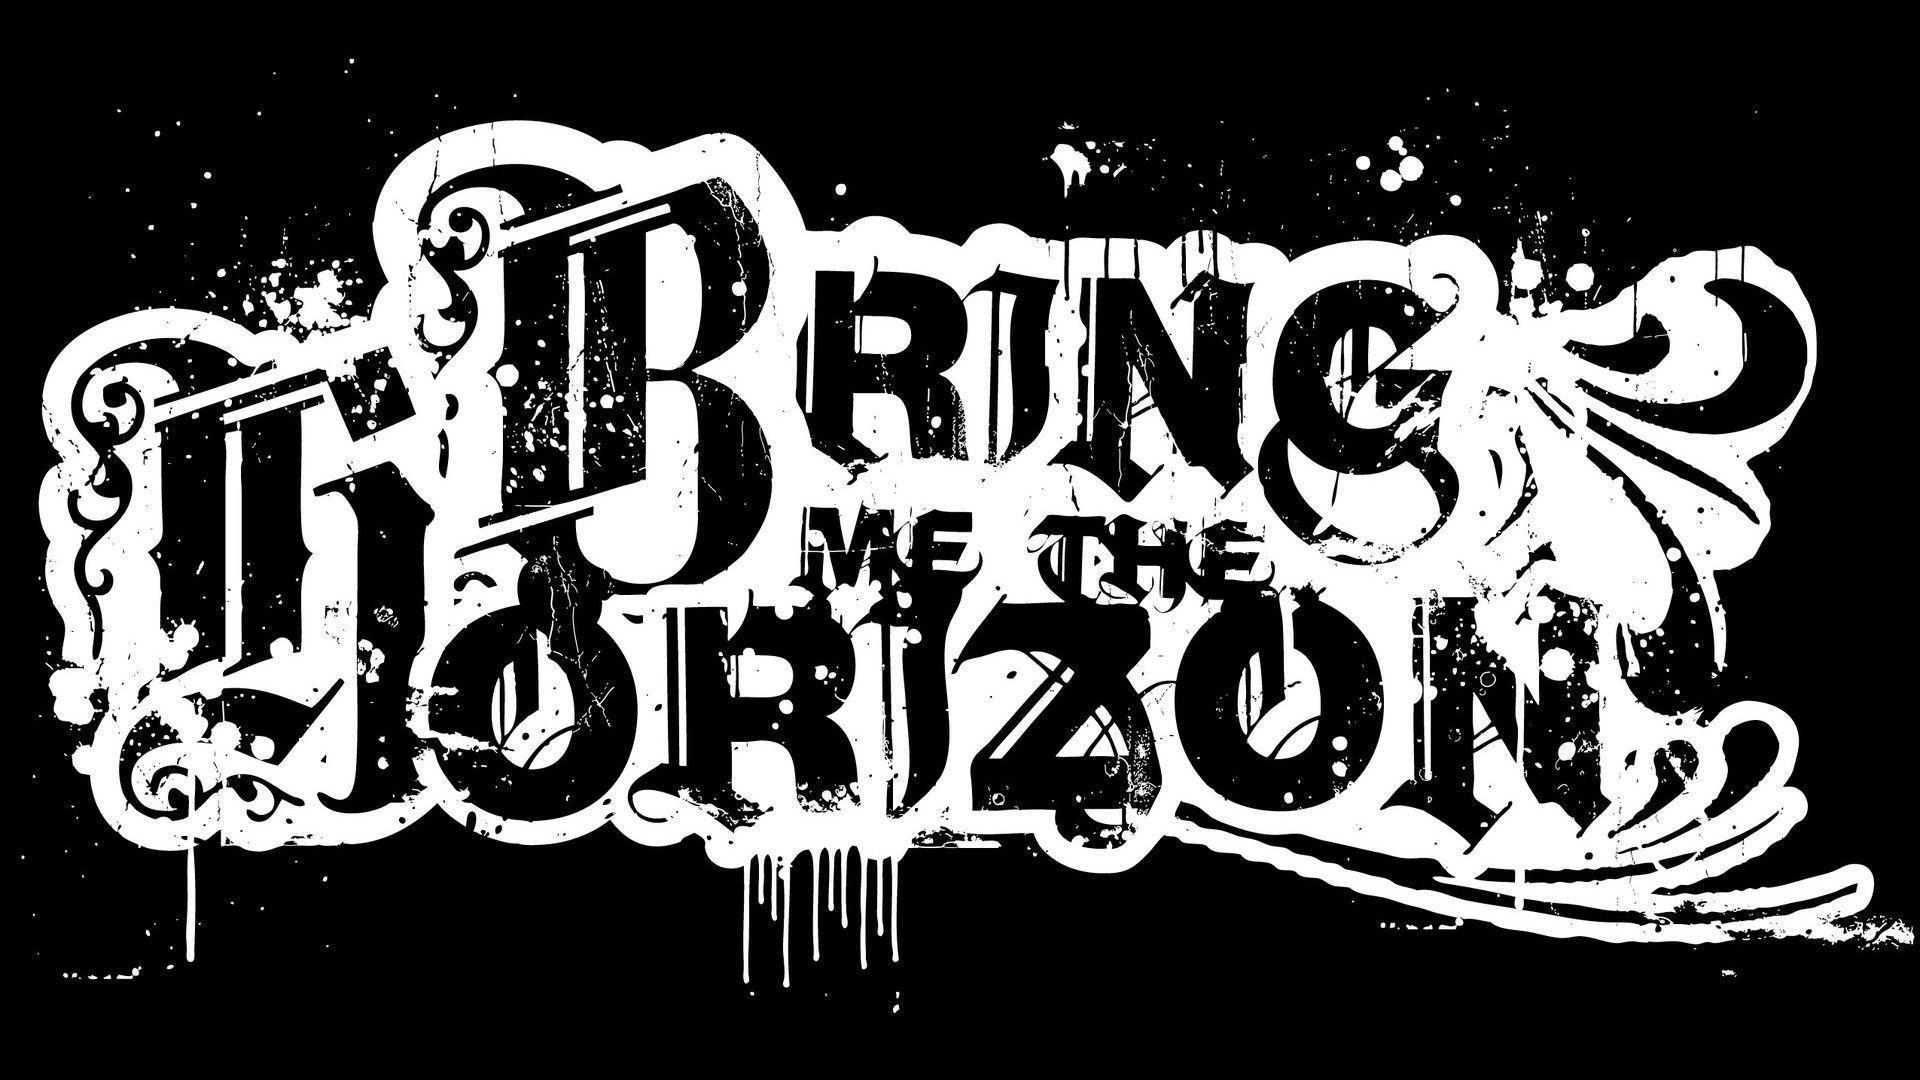 Bring Me The Horizon Wallpapers 2016 Wallpaper Cave